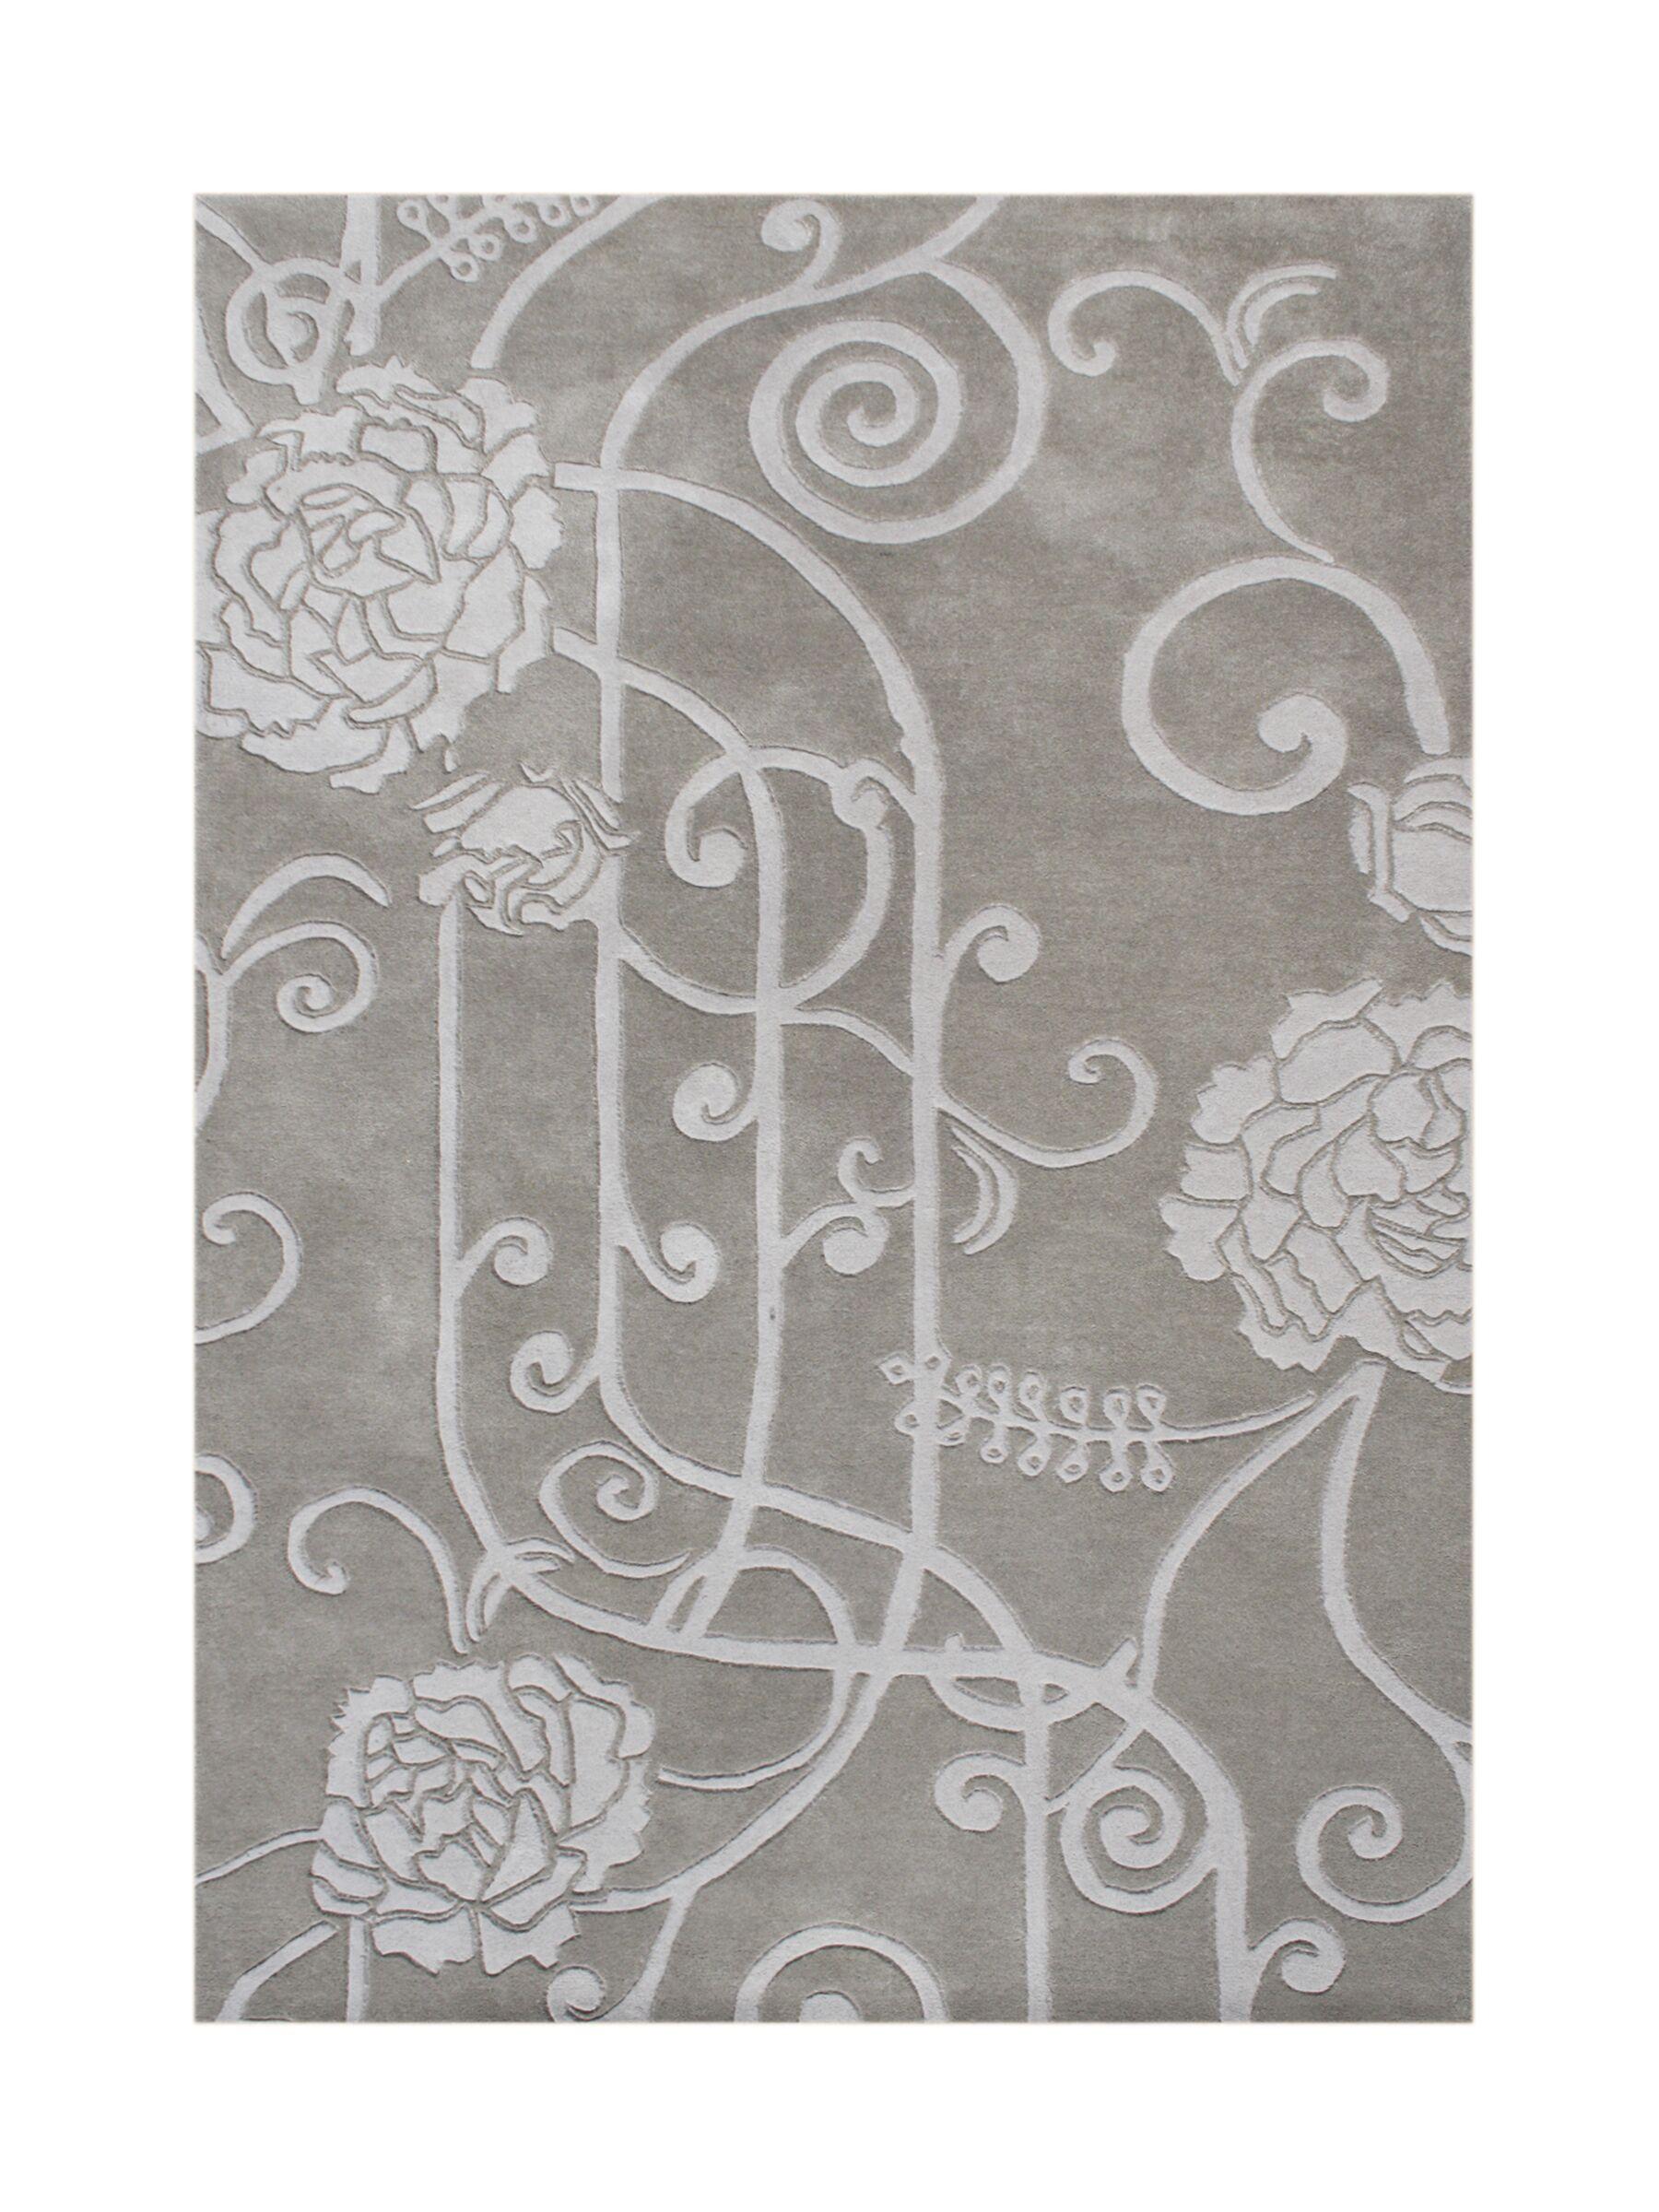 Sprague Hand-Tufted Gray Area Rug Rug Size: Rectangle 5' x 8'